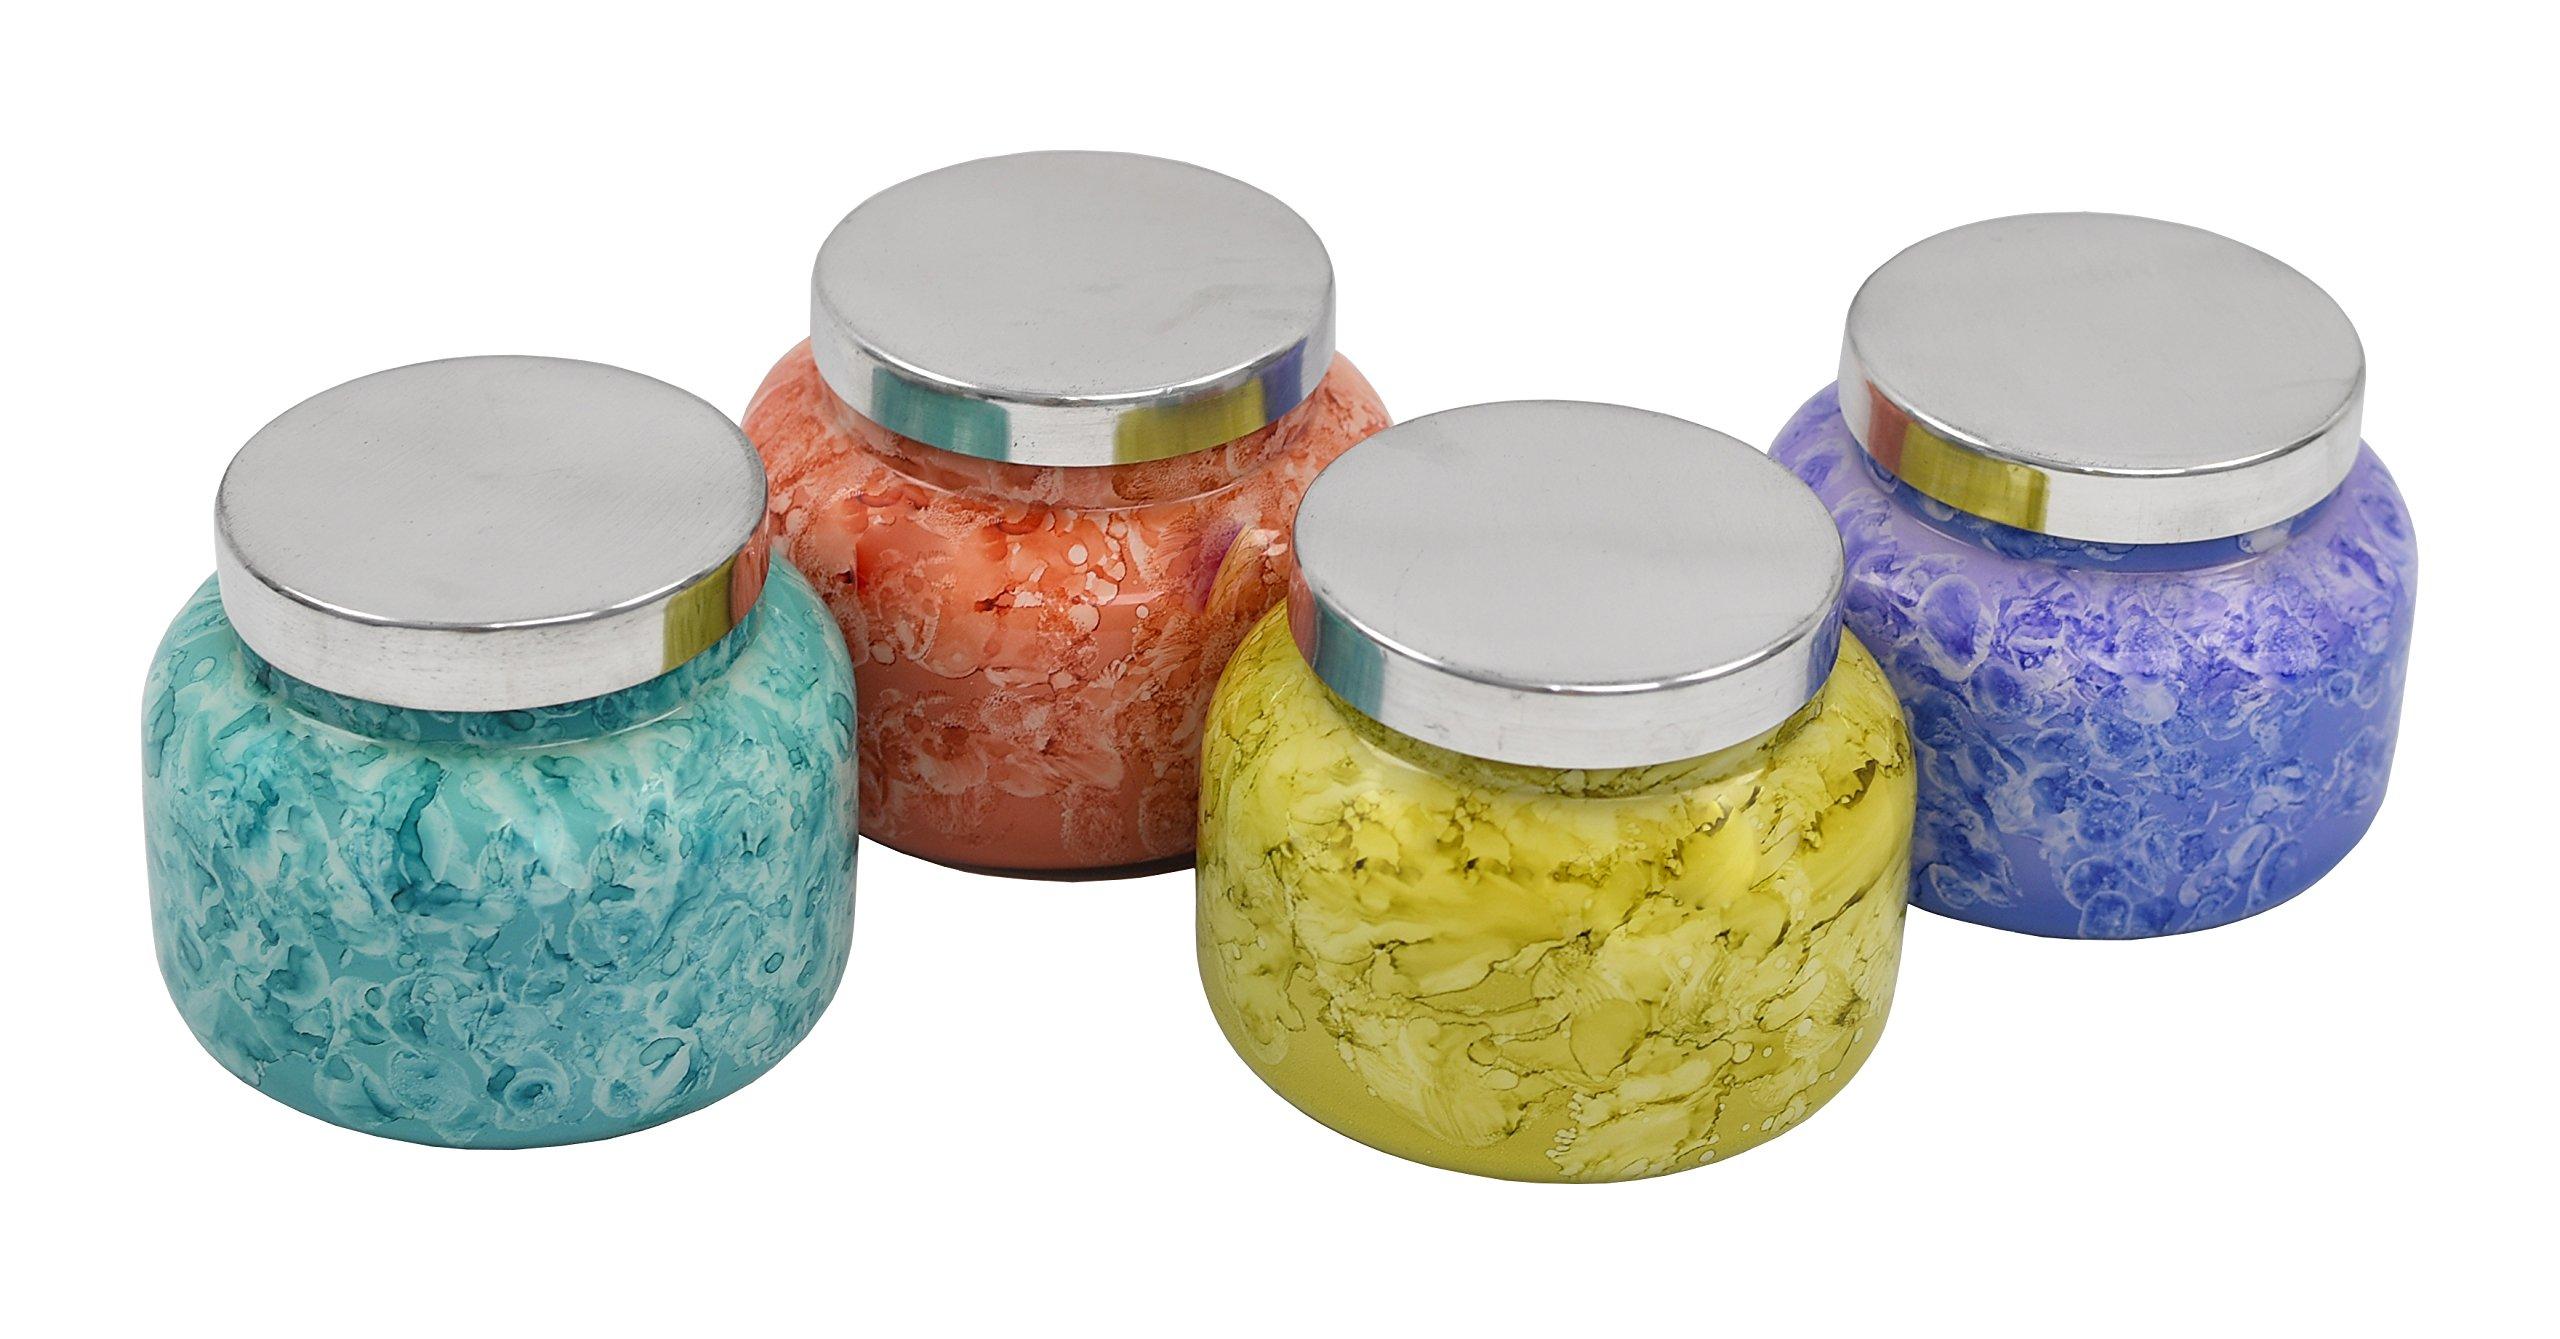 Capri Blue 19 oz. Set of 4 Watercolor Collection Jar Candle - Aloha Orchid, Blue Jean, Pomegranate Citrus & Volcano.